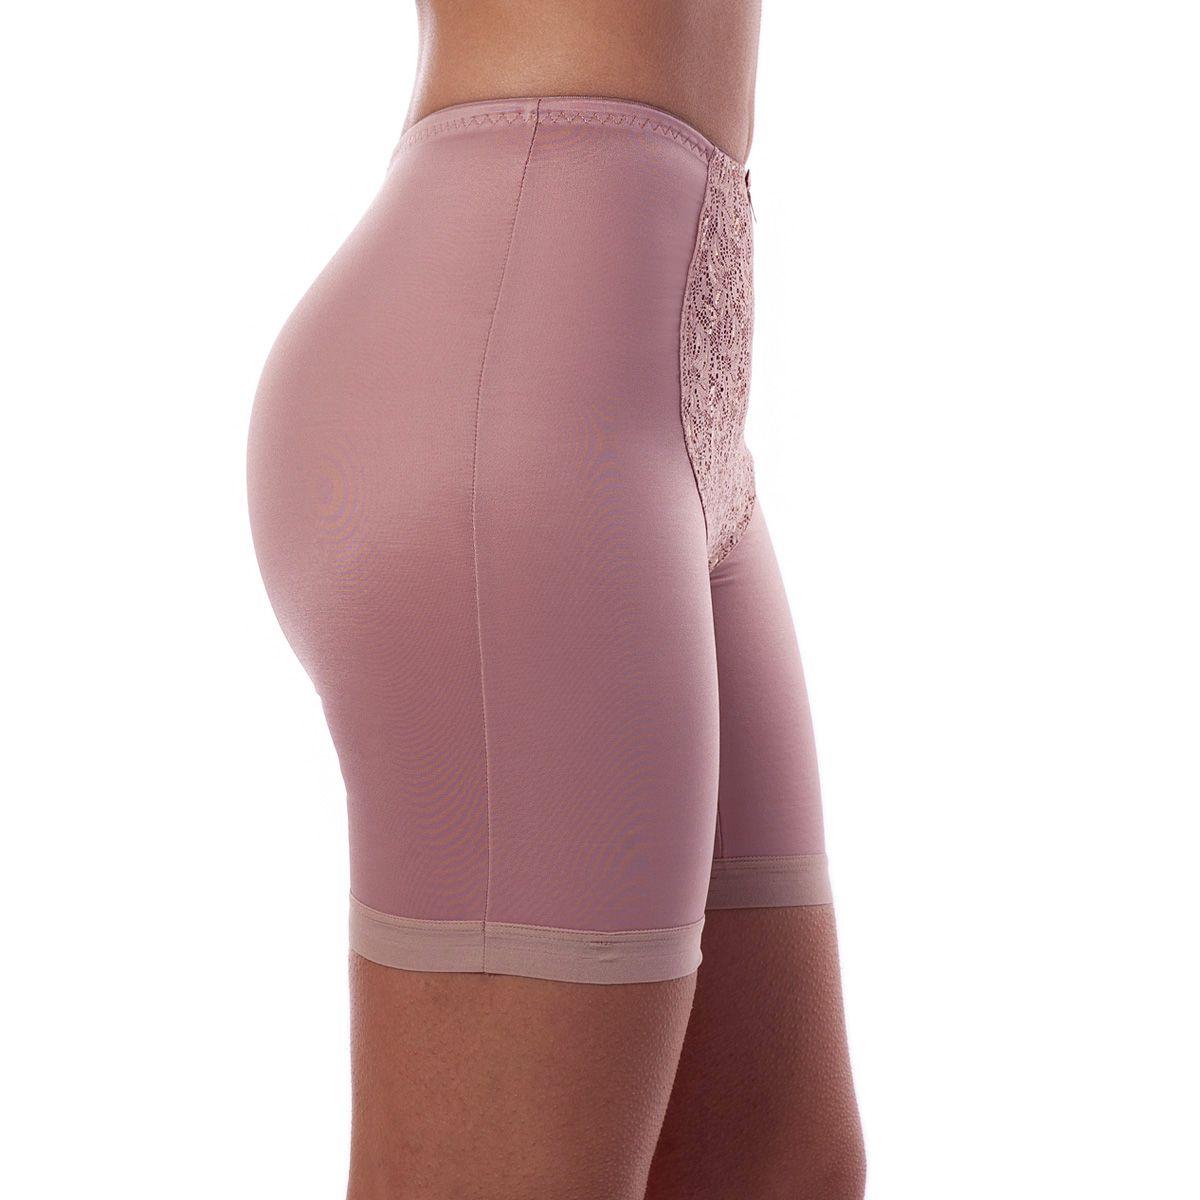 Bermuda Modeladora Kit com 2 Shorts Modelador Princesa Catarina